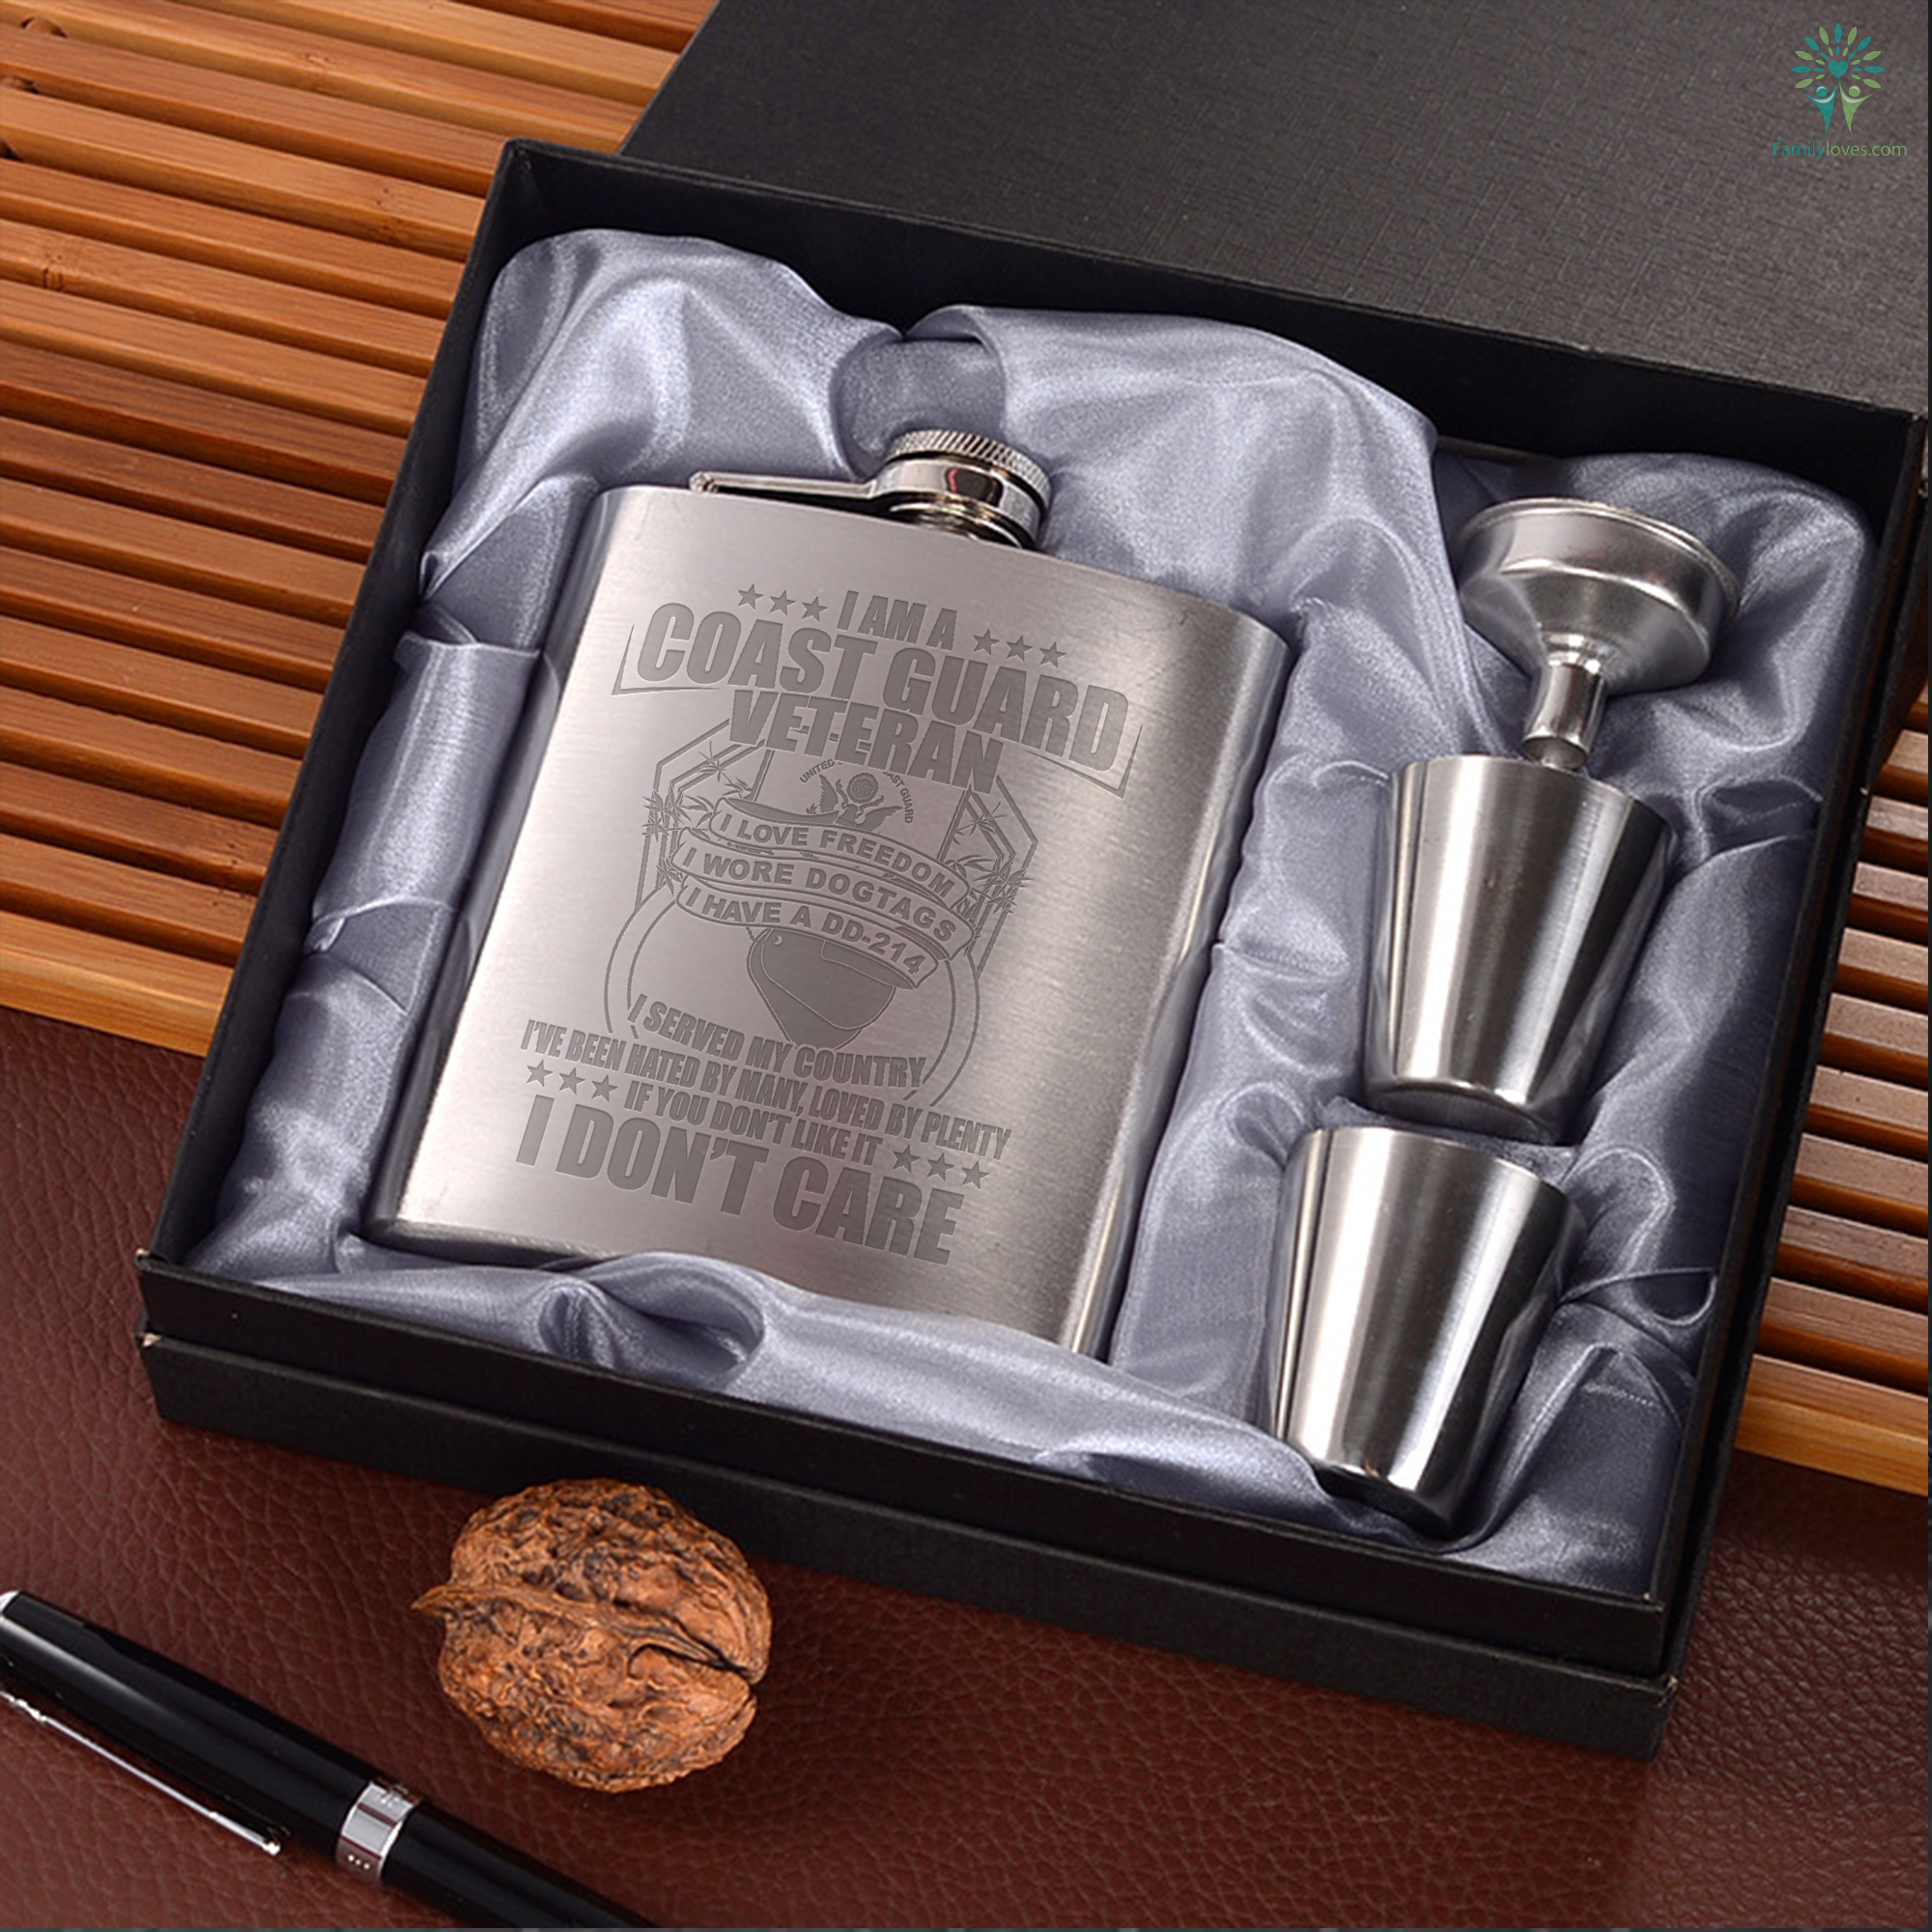 I Am A Coast Guard Veteran... Portable Stainless Steel Wine Familyloves.com